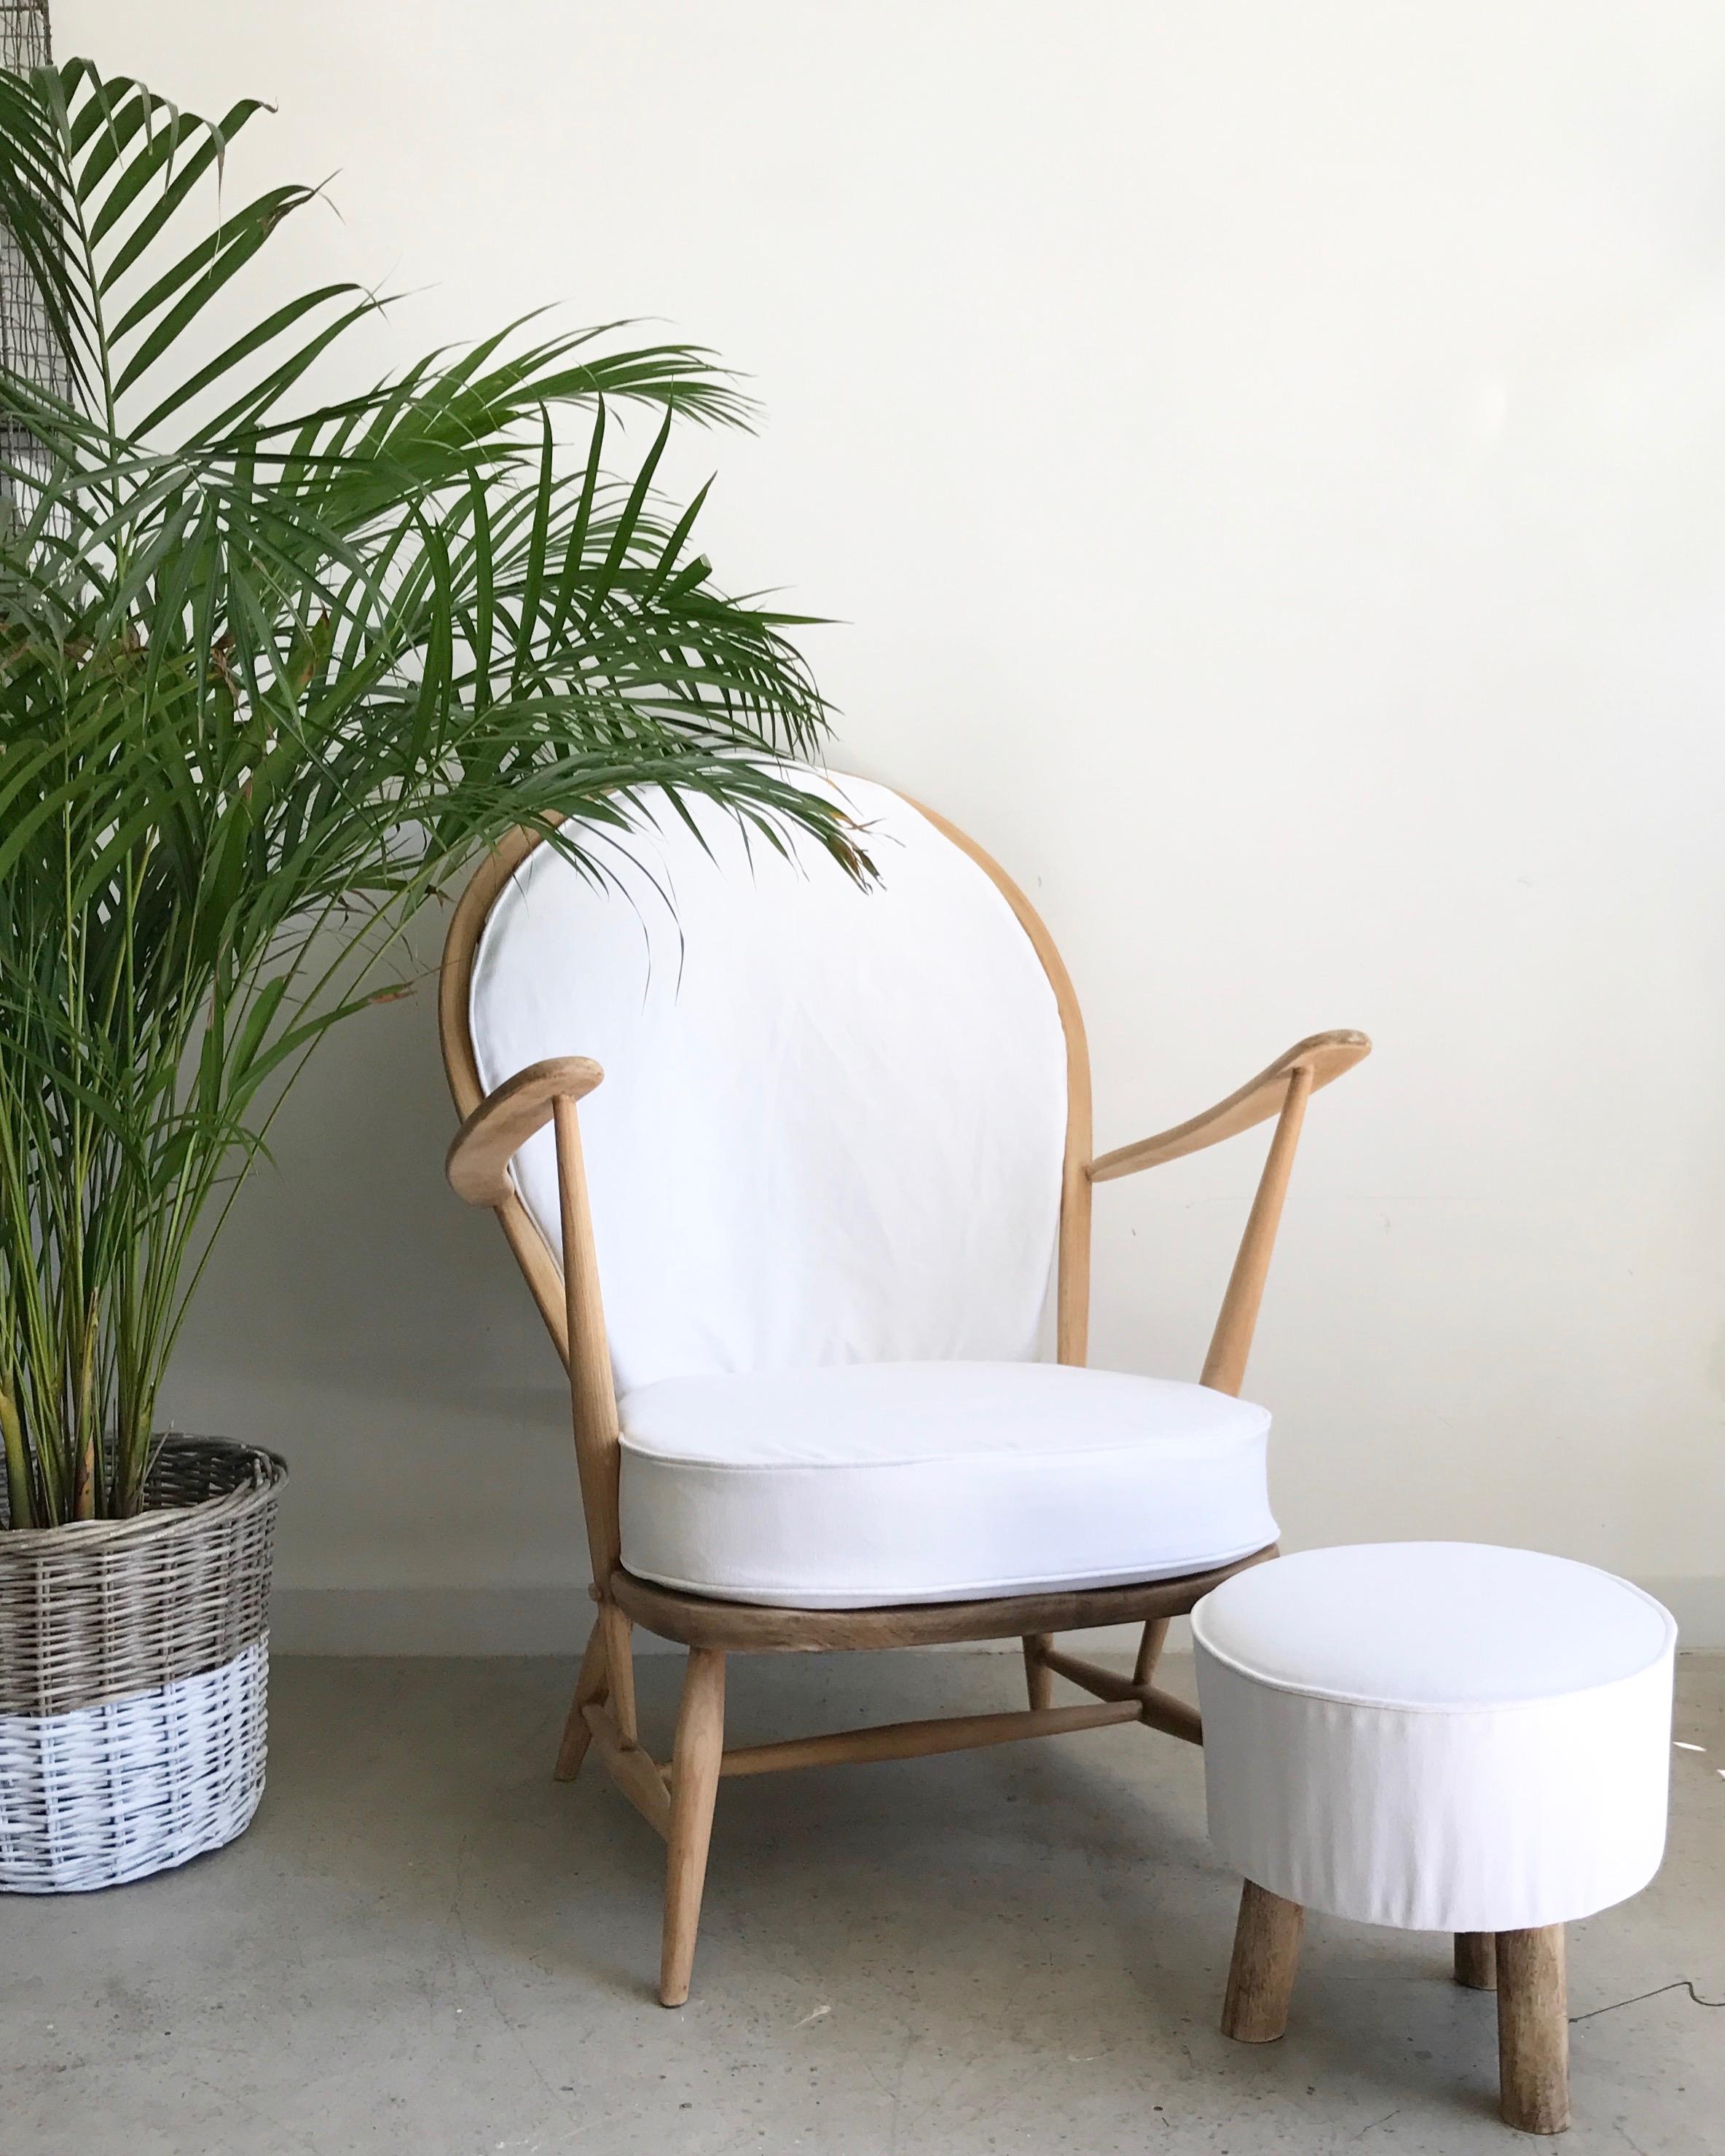 Residential: Nursery chair & footstool upholstery.